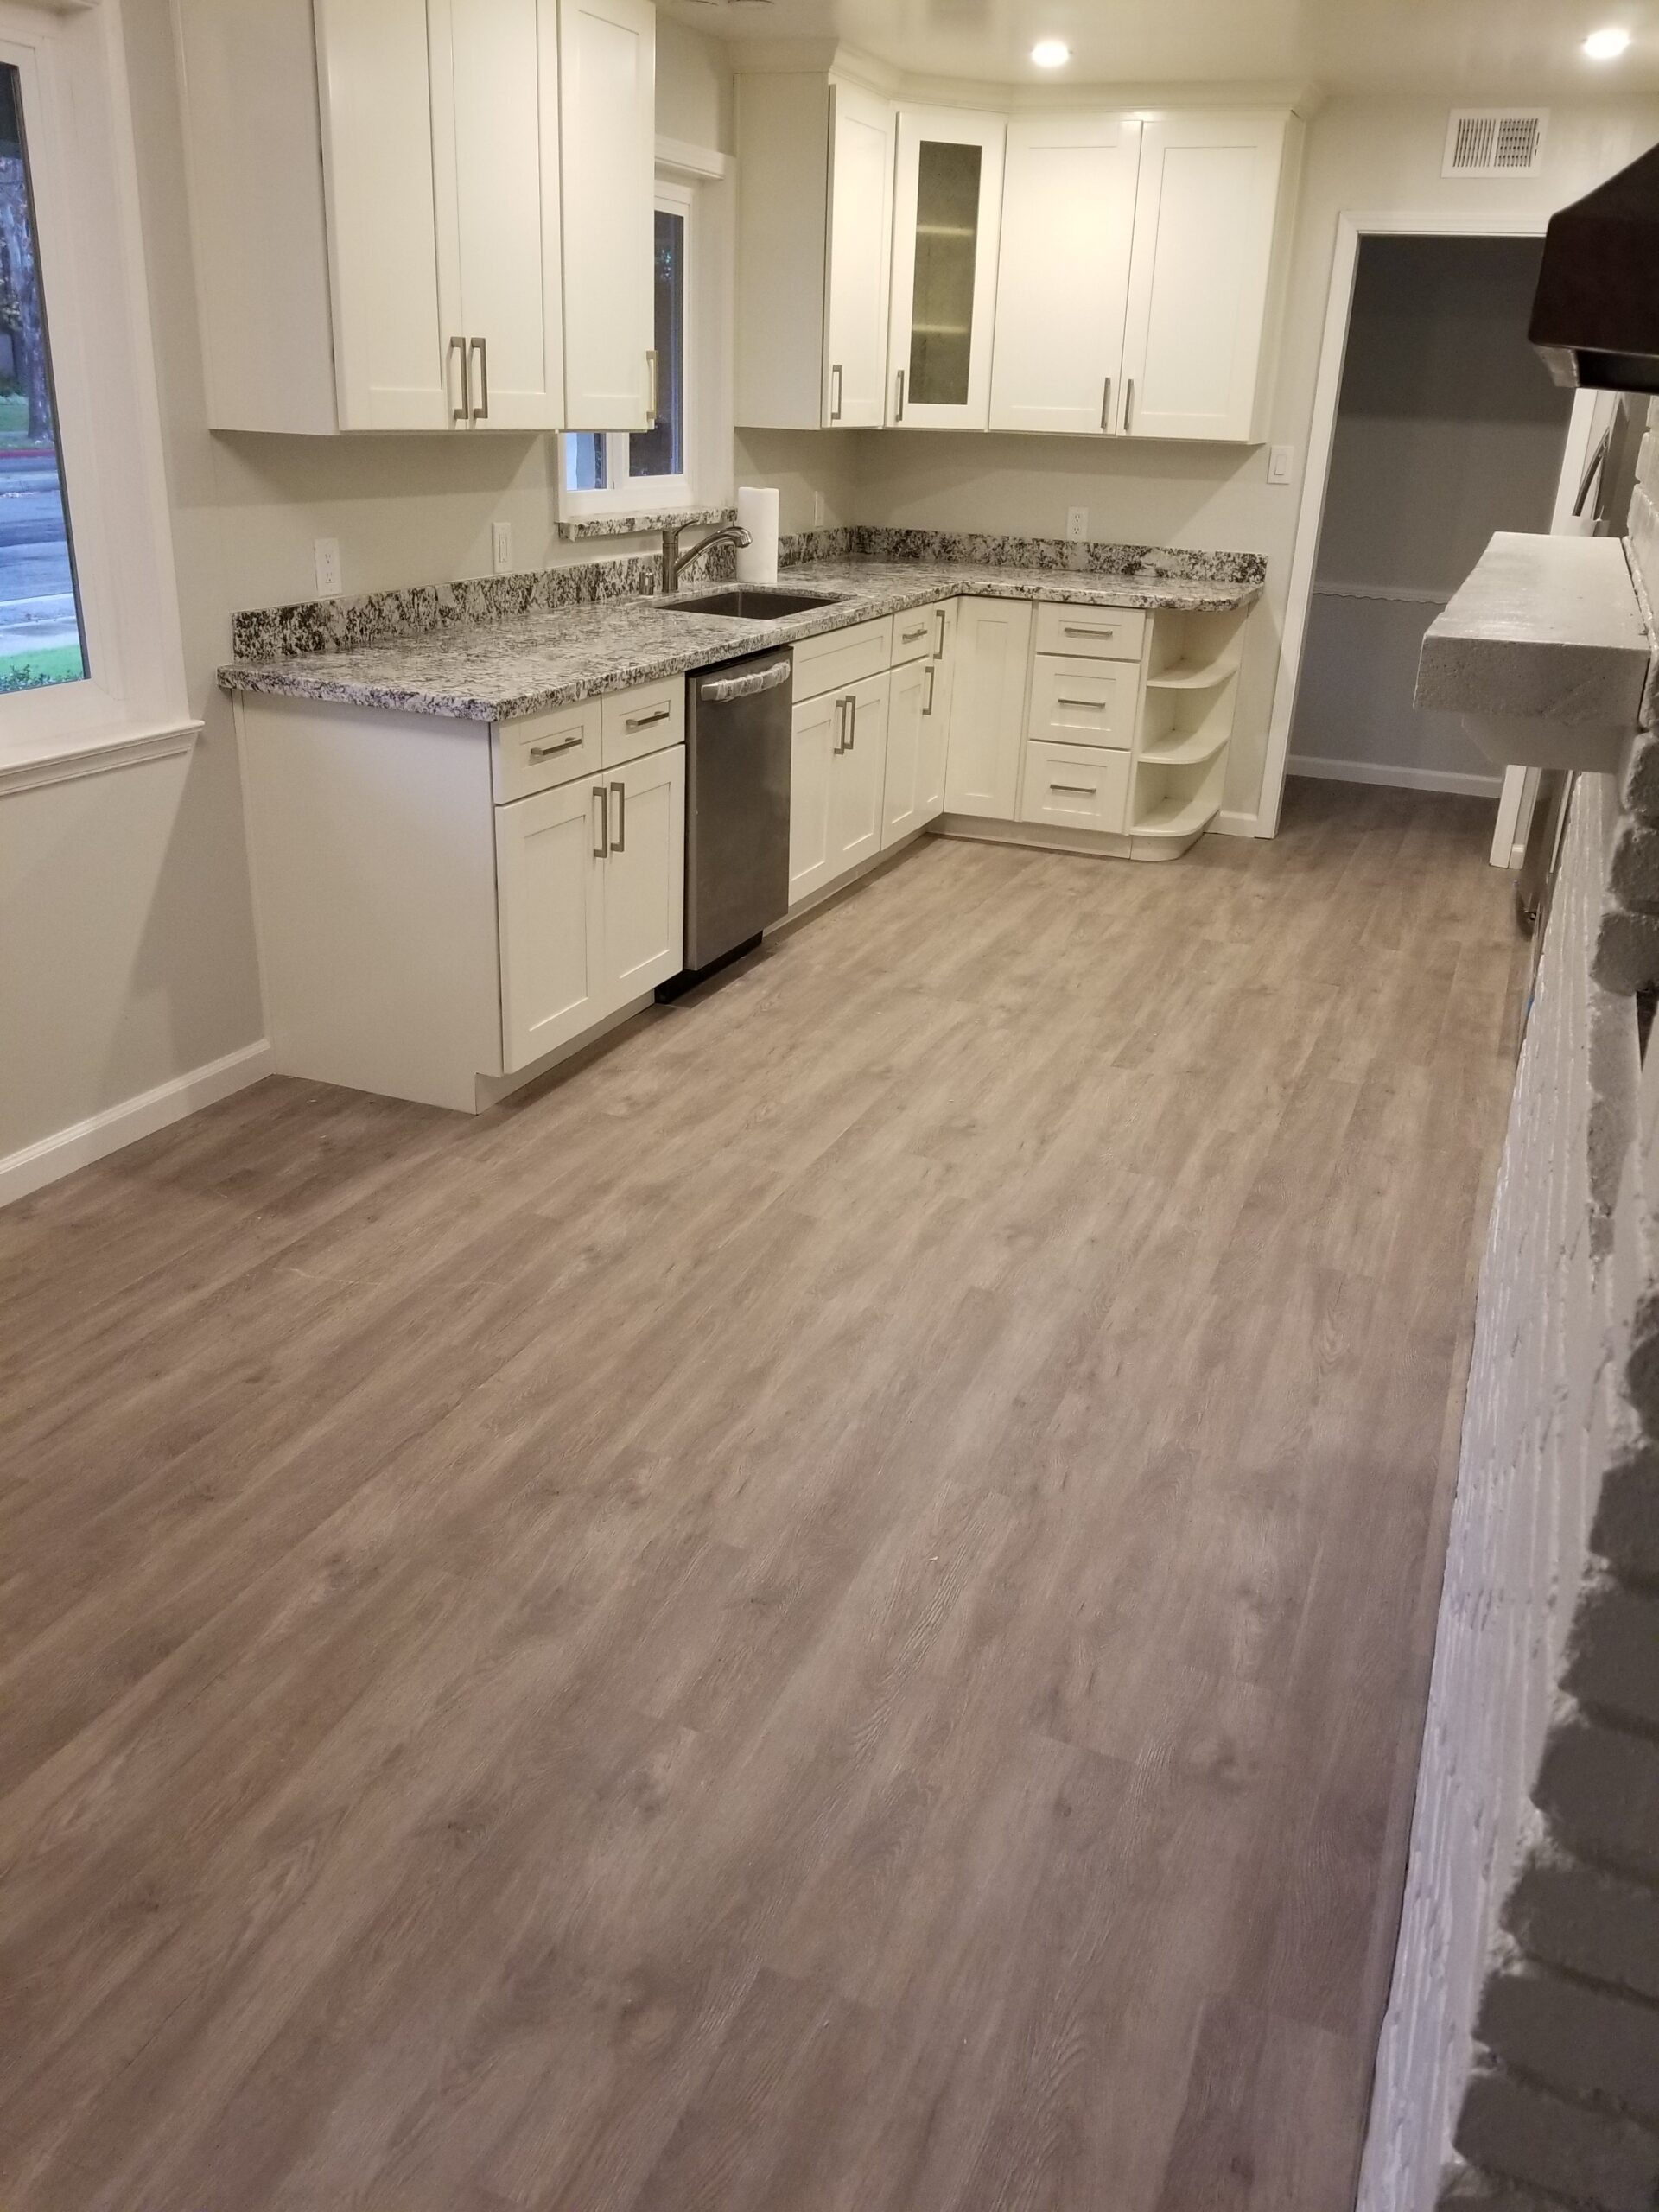 """Before"": Sunnyvale, living room repair /refinish rad oak hardwood flooring."